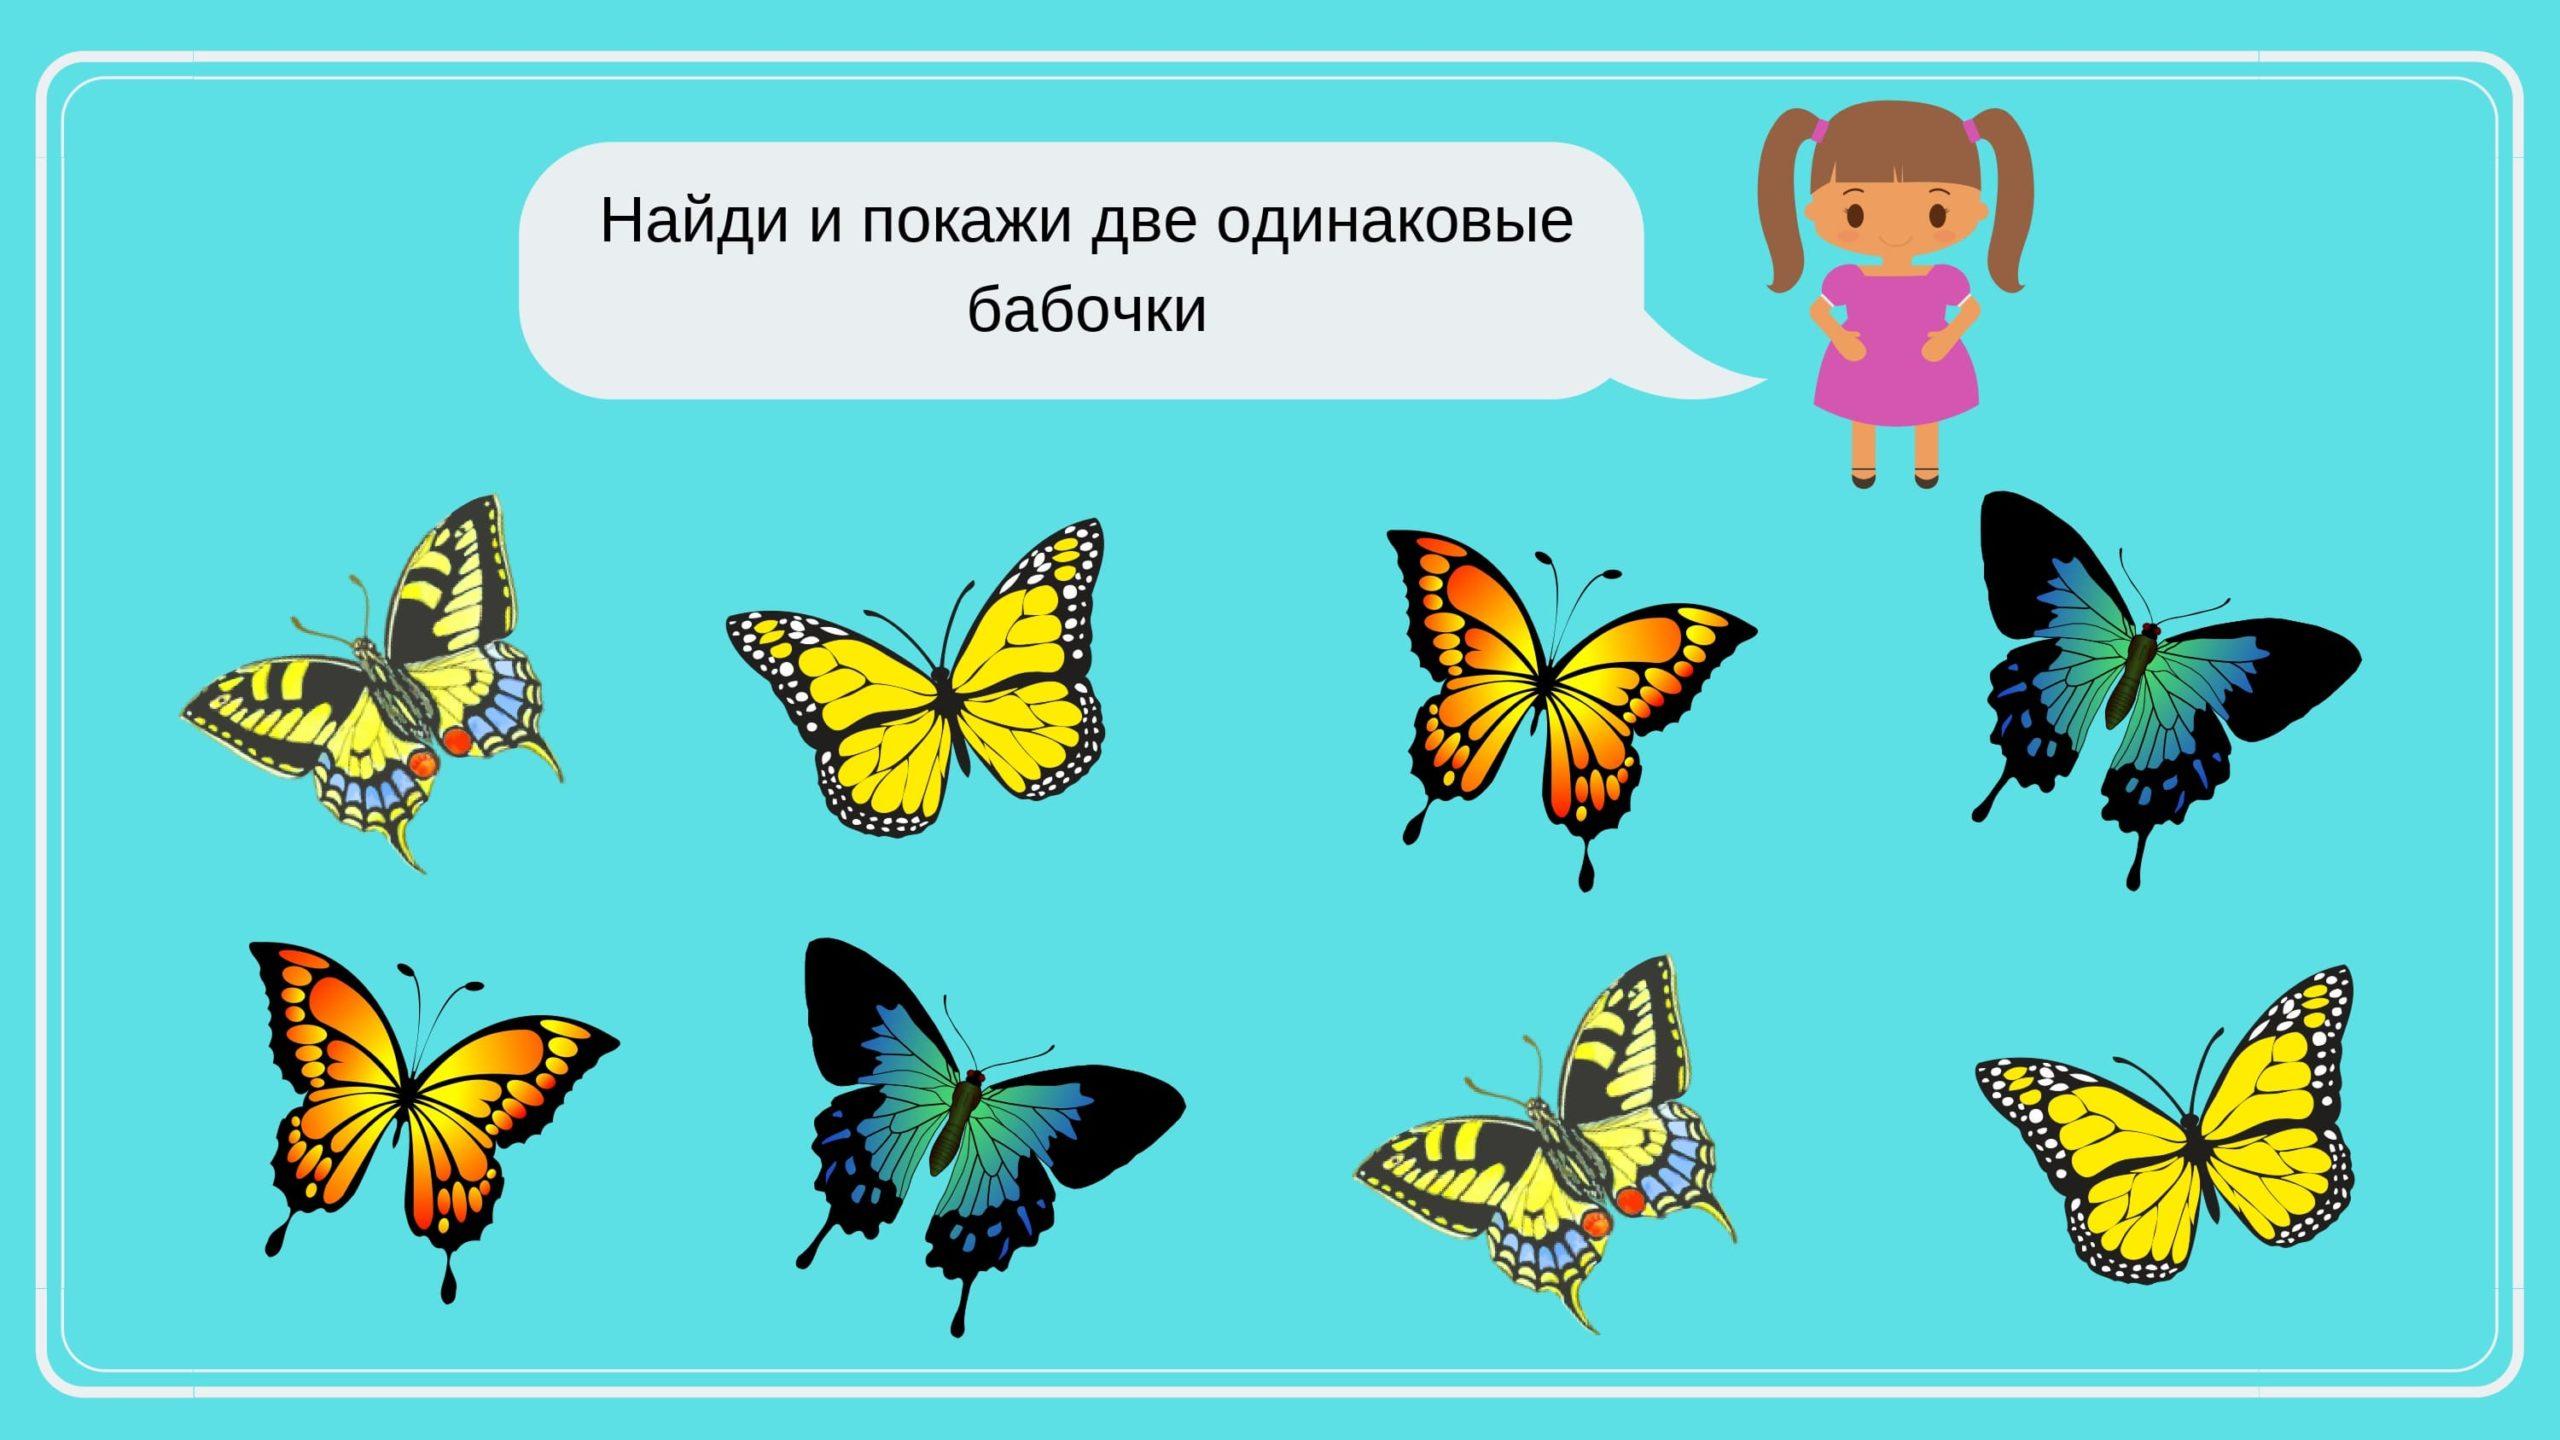 найди одинаковые бабочки